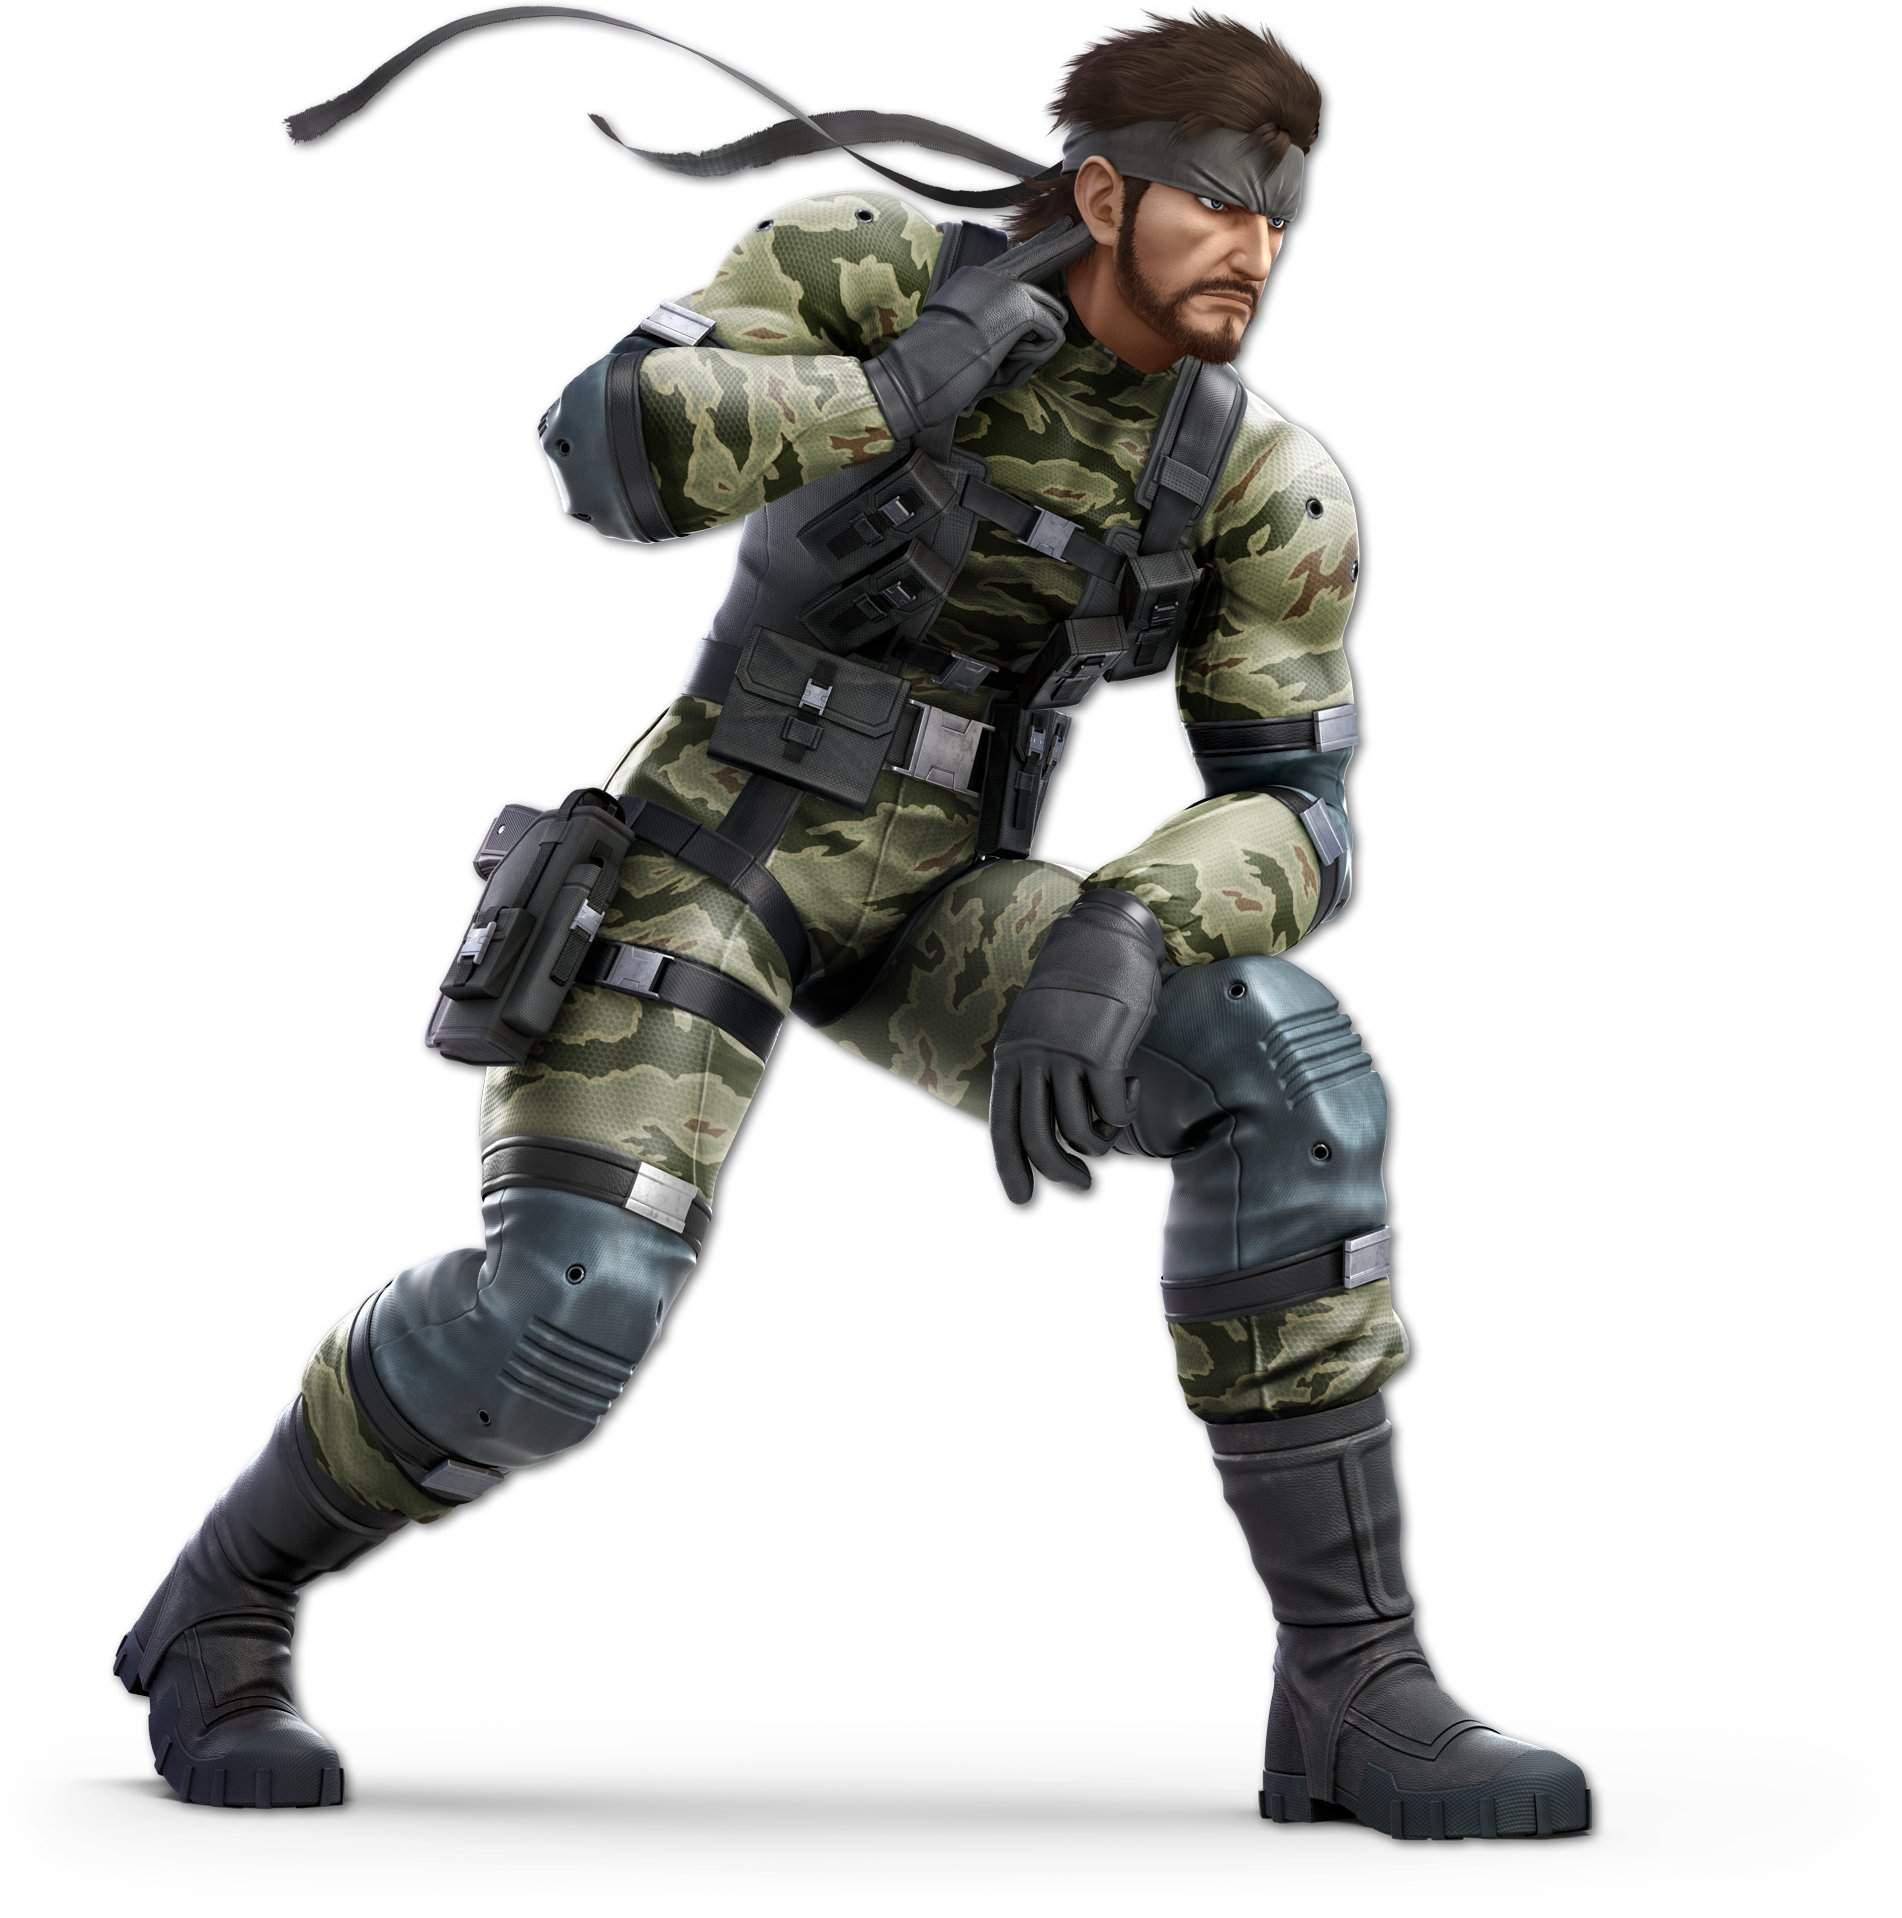 Naked Snake (Metal Gear Solid 3 : Snake Eater)